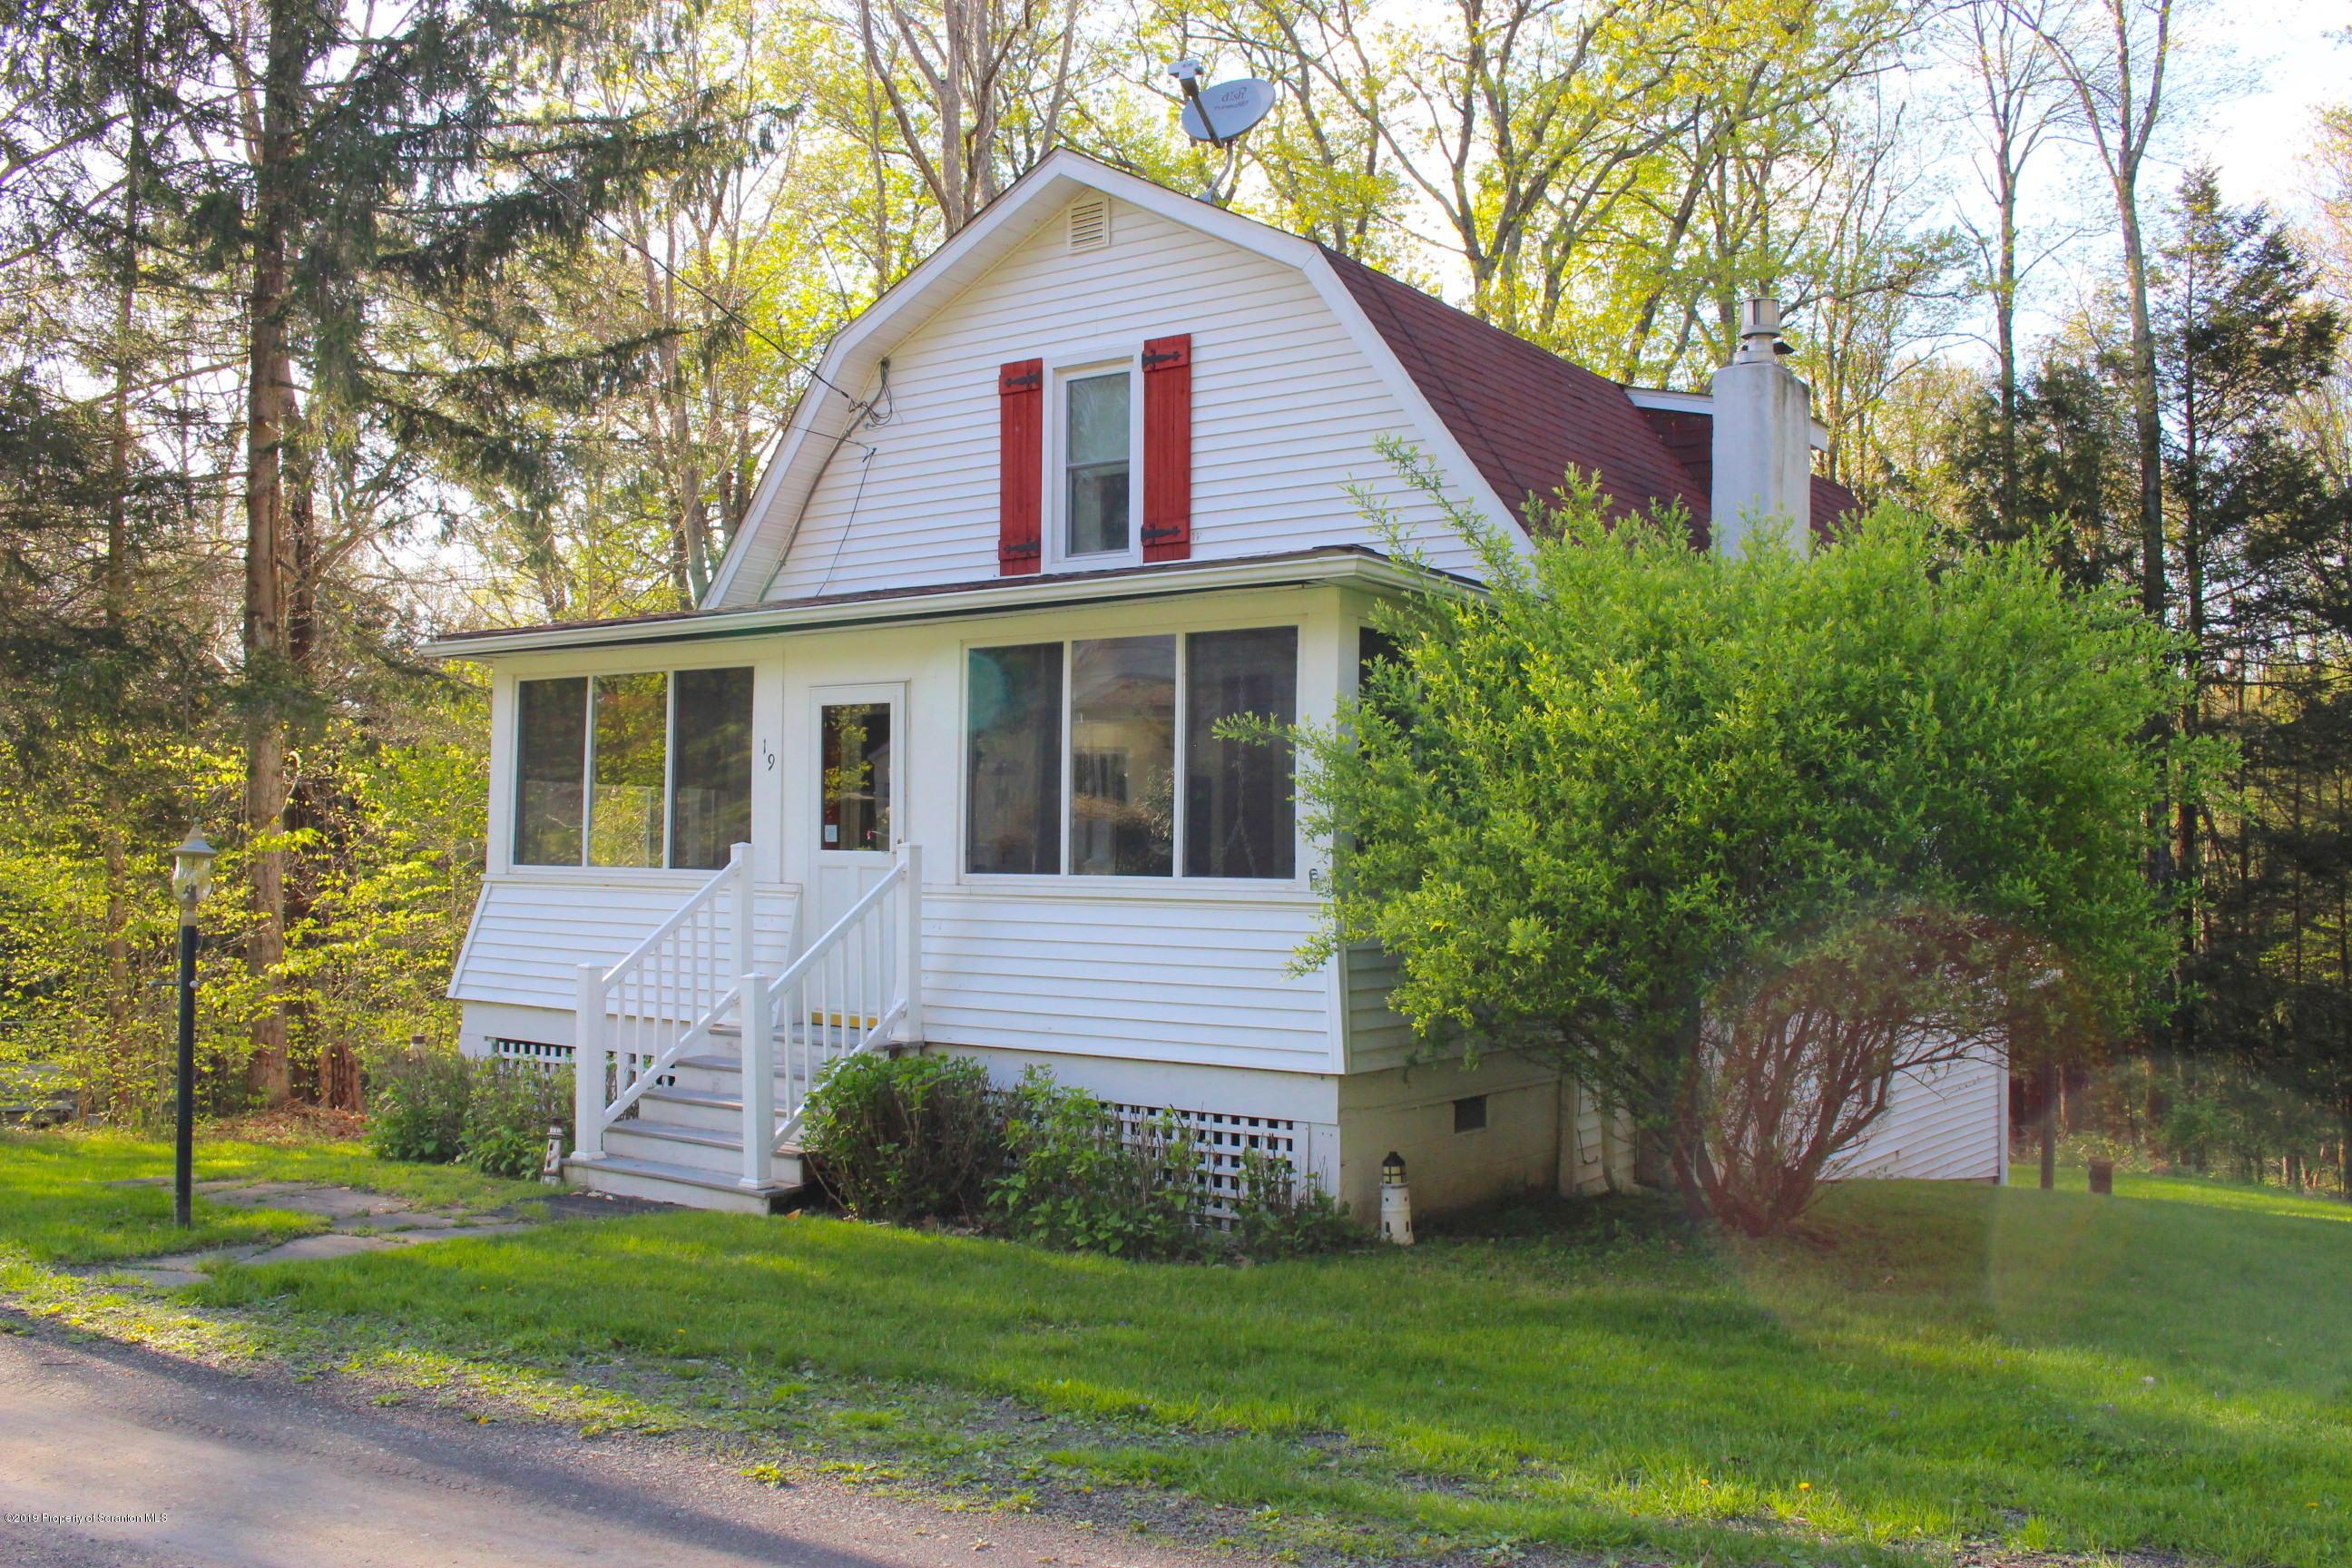 19 Holbrook Rd, Tunkhannock, Pennsylvania 18657, 3 Bedrooms Bedrooms, 5 Rooms Rooms,2 BathroomsBathrooms,Single Family,For Sale,Holbrook,18-1699